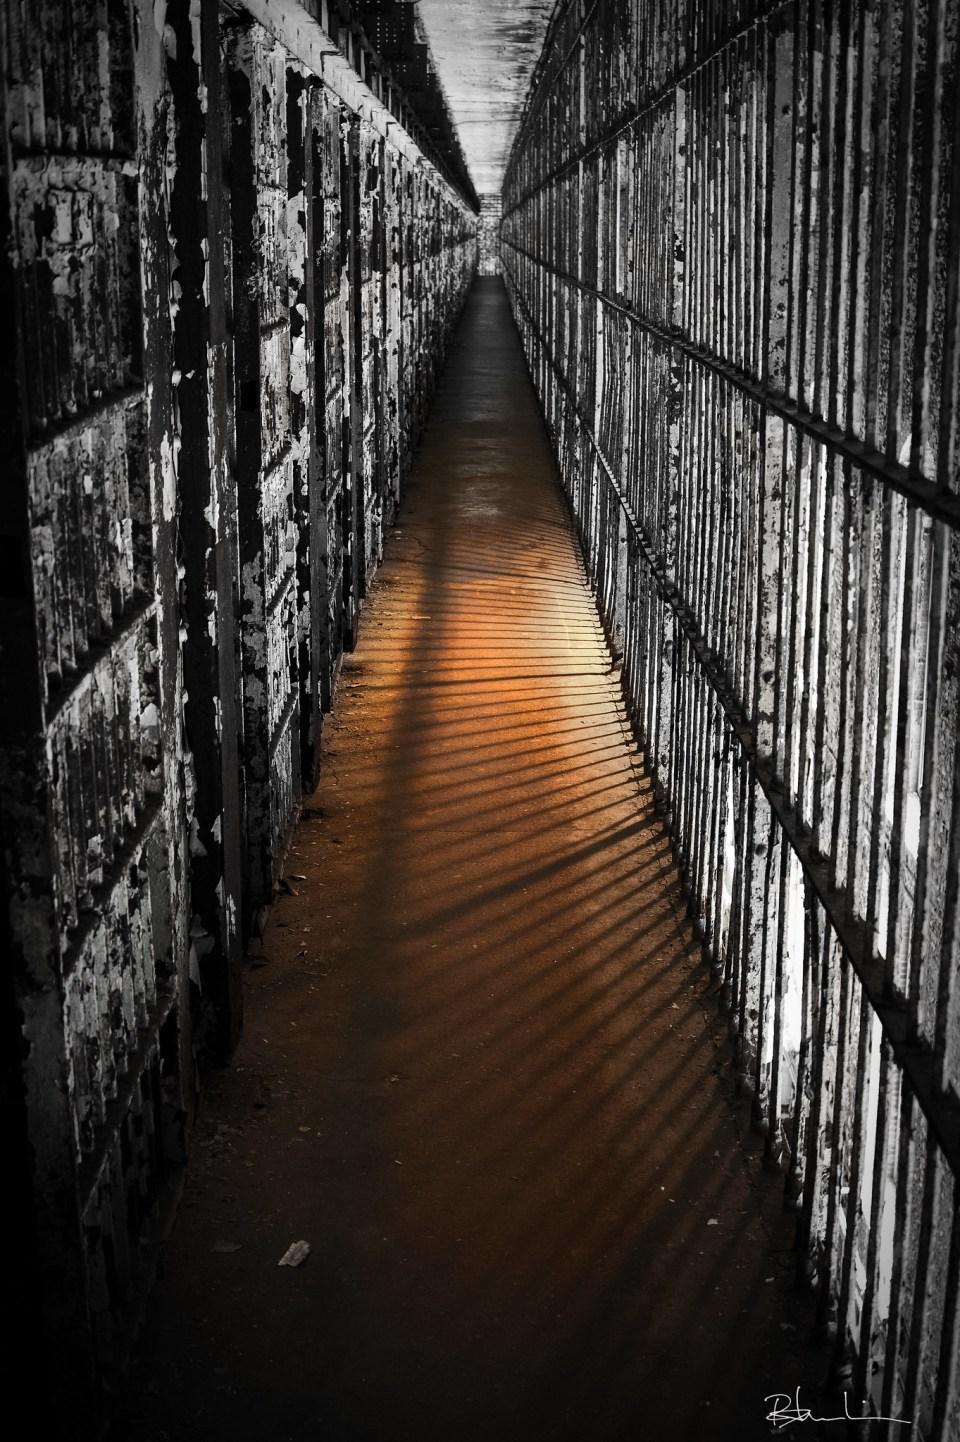 Cellblock